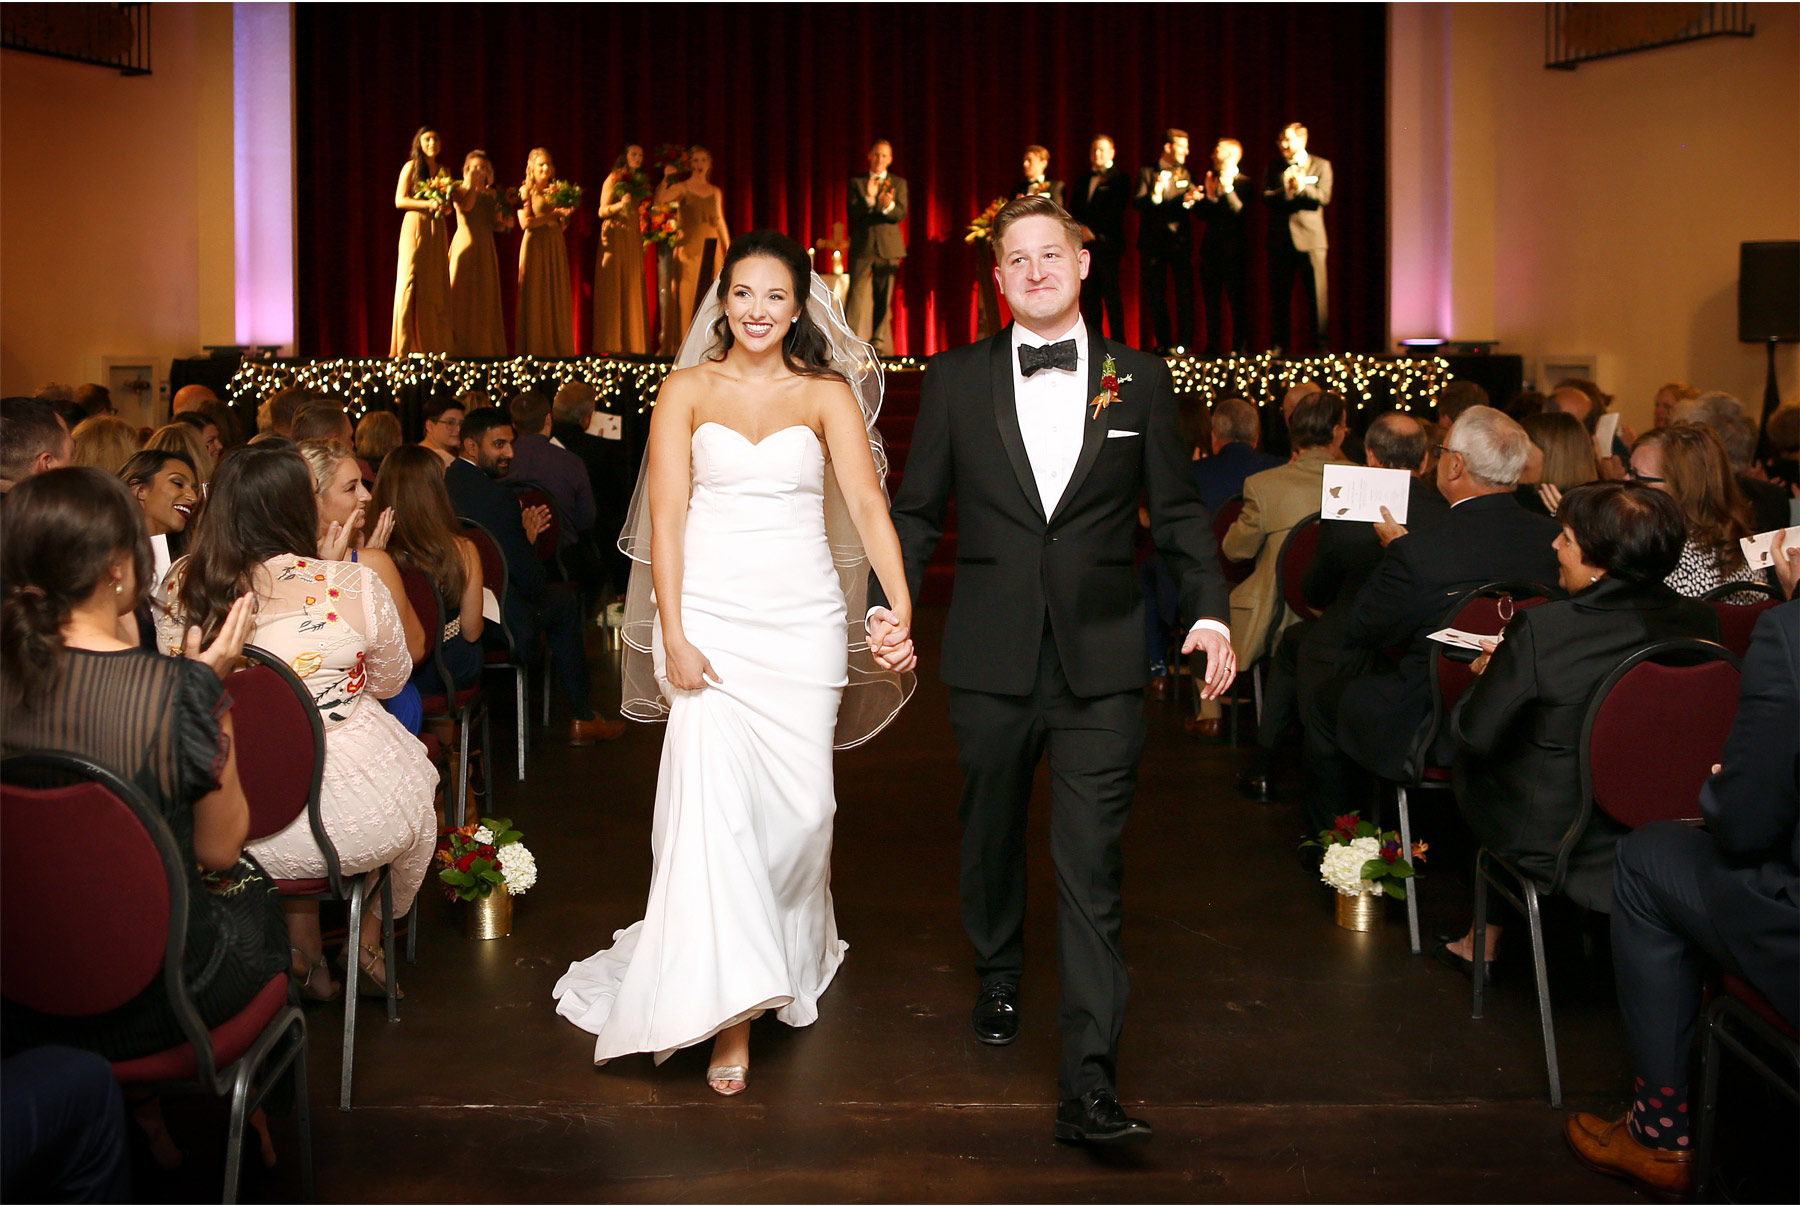 17-Kansas-City-Missouri-Destination-Wedding-Photography-by-Vick-Photography-Madrid-Theatre-Ceremony-Carly-and-Kenny.jpg